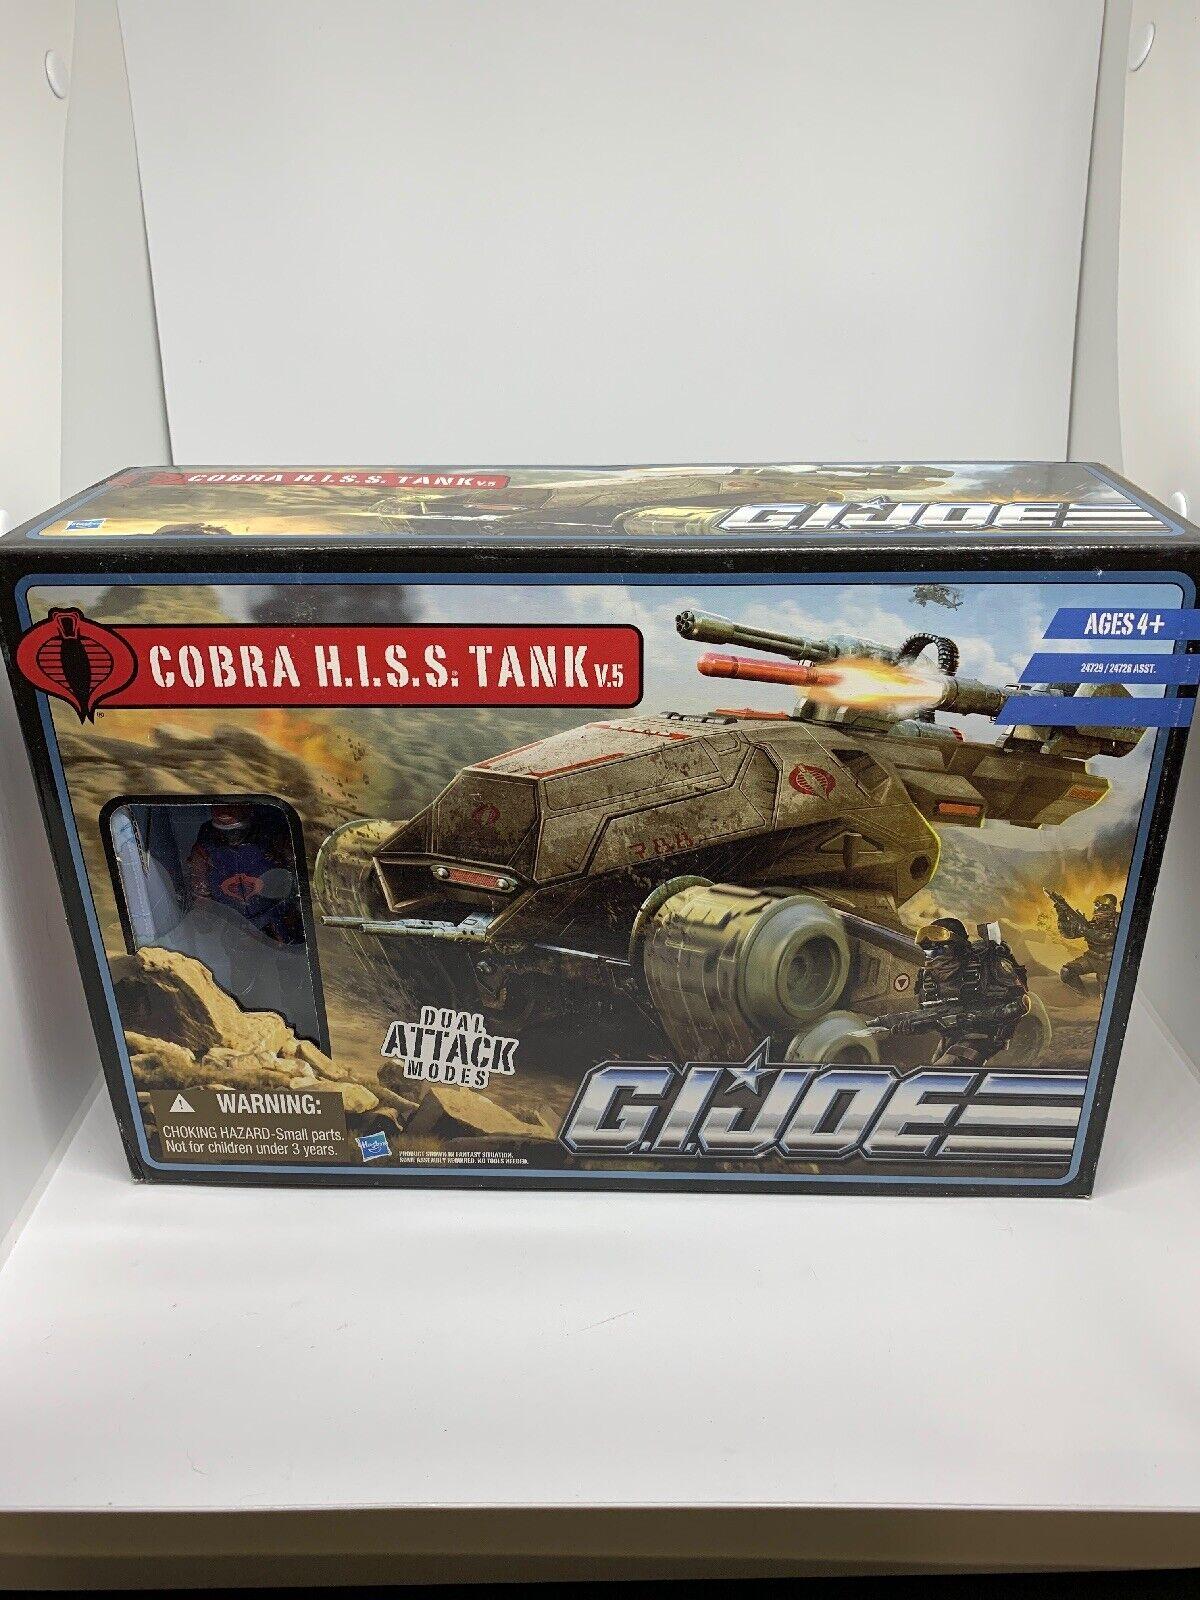 Gi Joe Cobra H.I.S.S Tank In New Sealed Condition